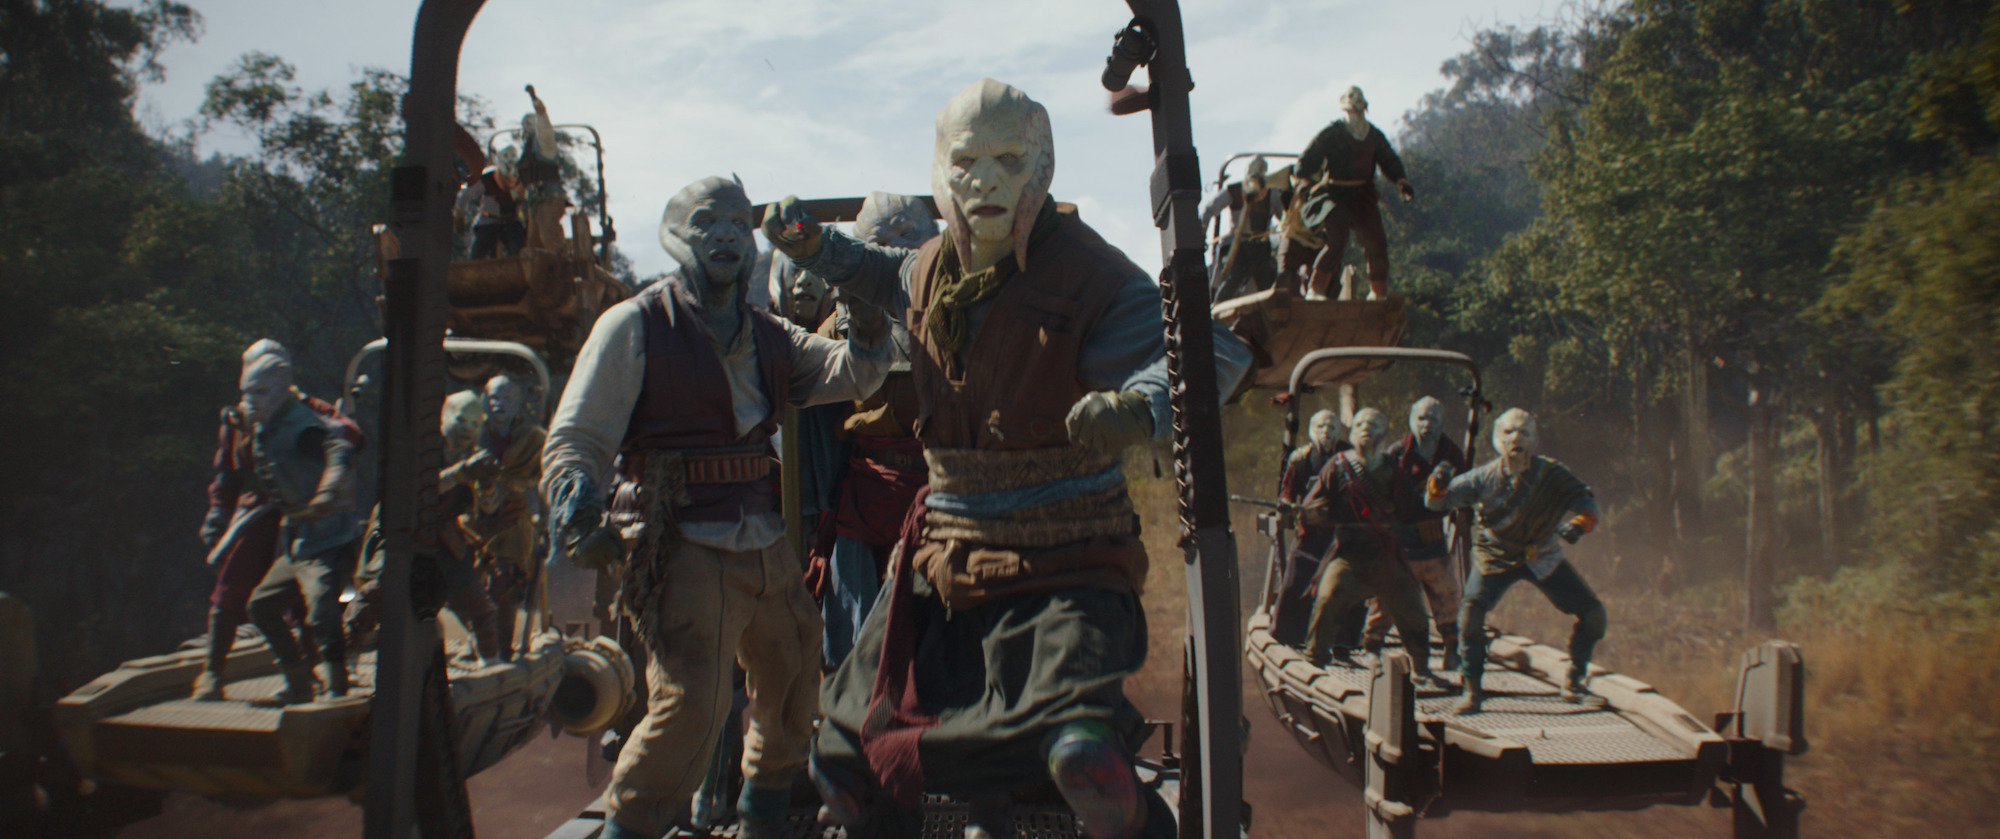 Pirates in 'The Mandalorian'